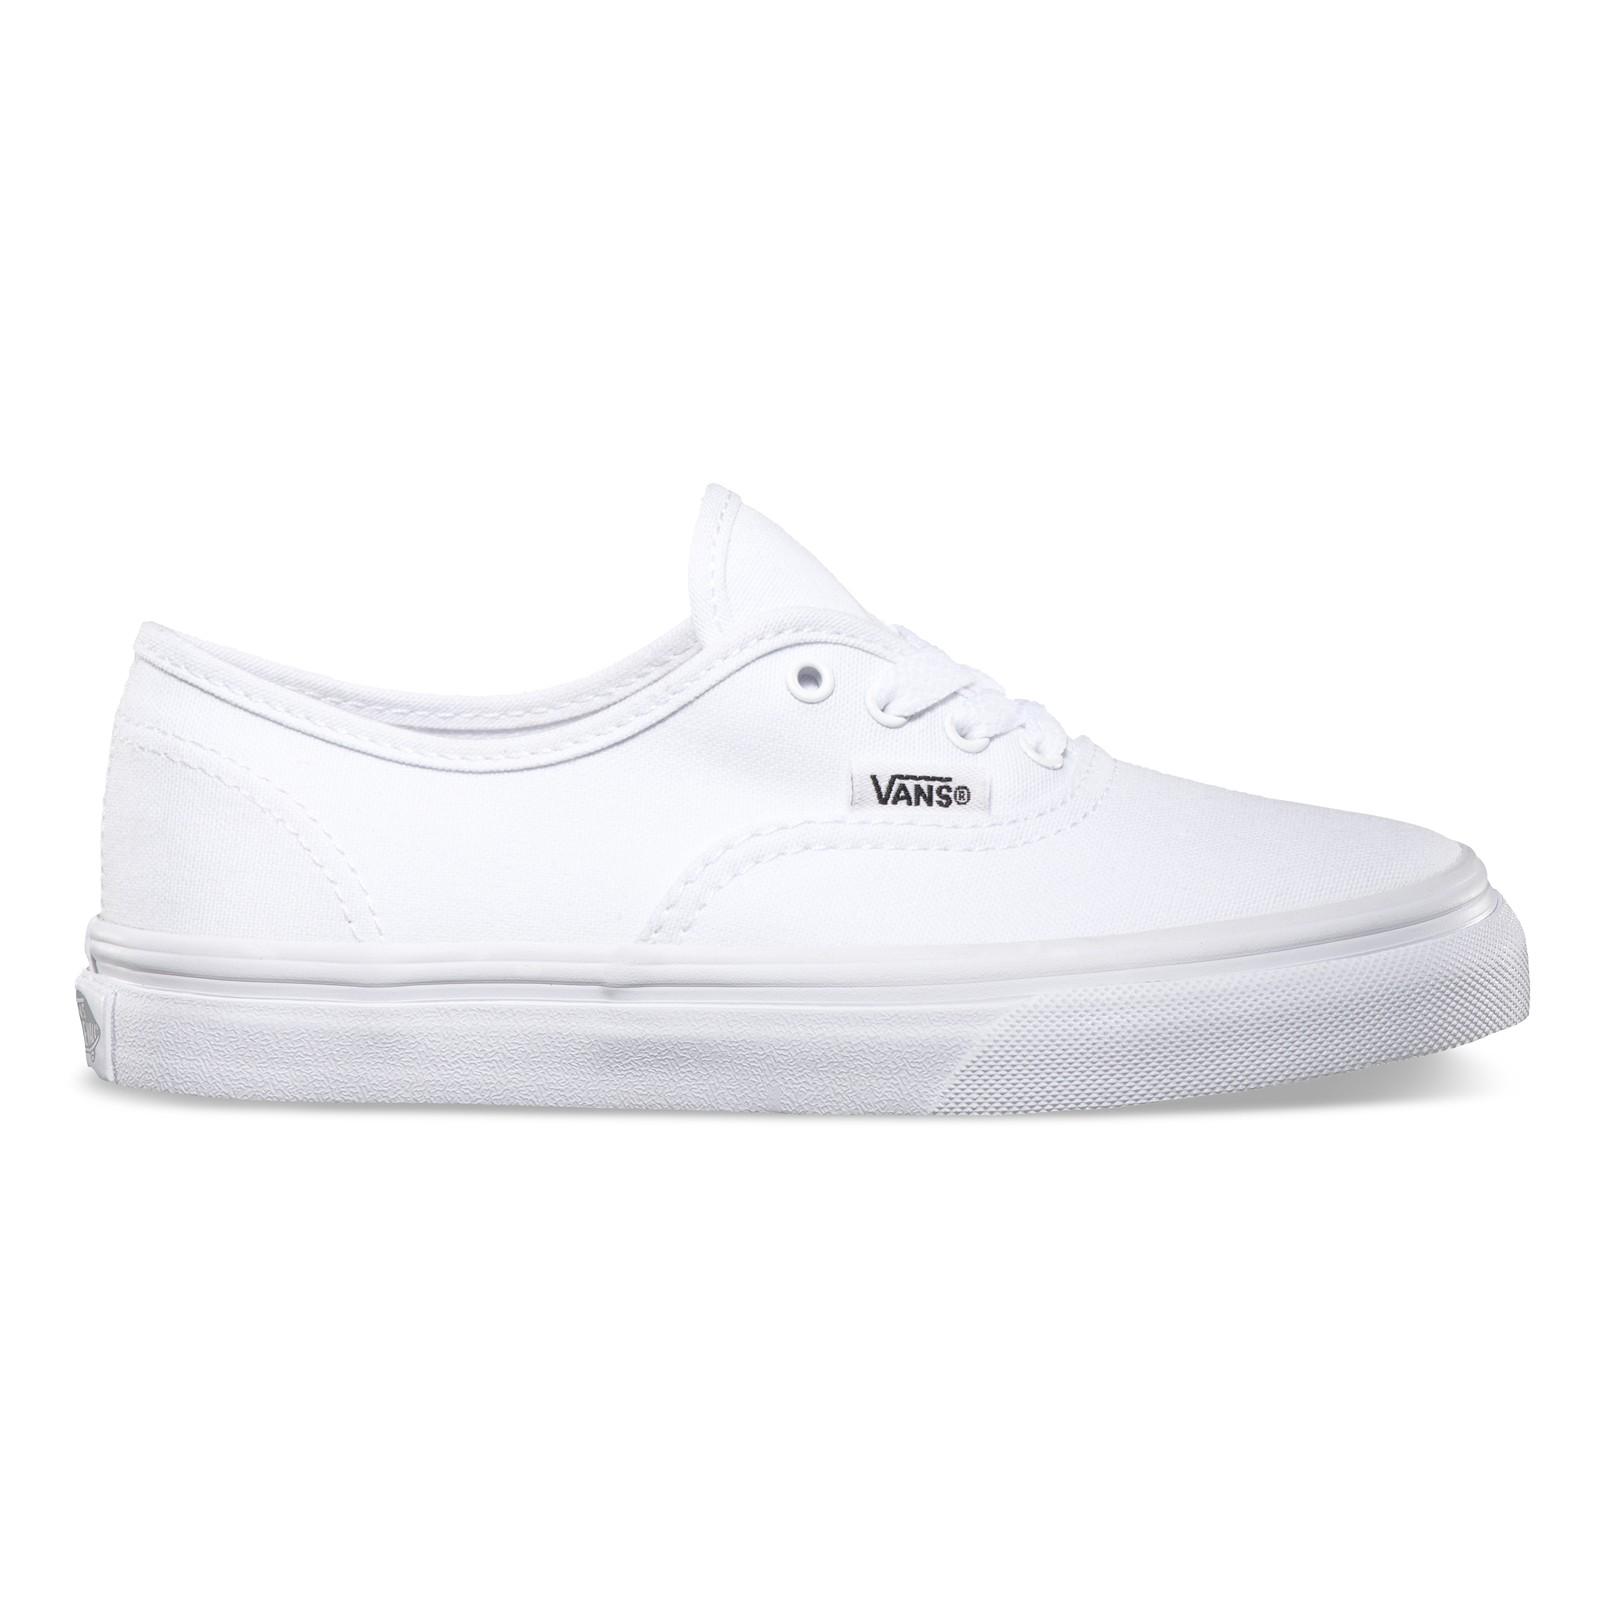 Vans Kids AUTHENTIC true White